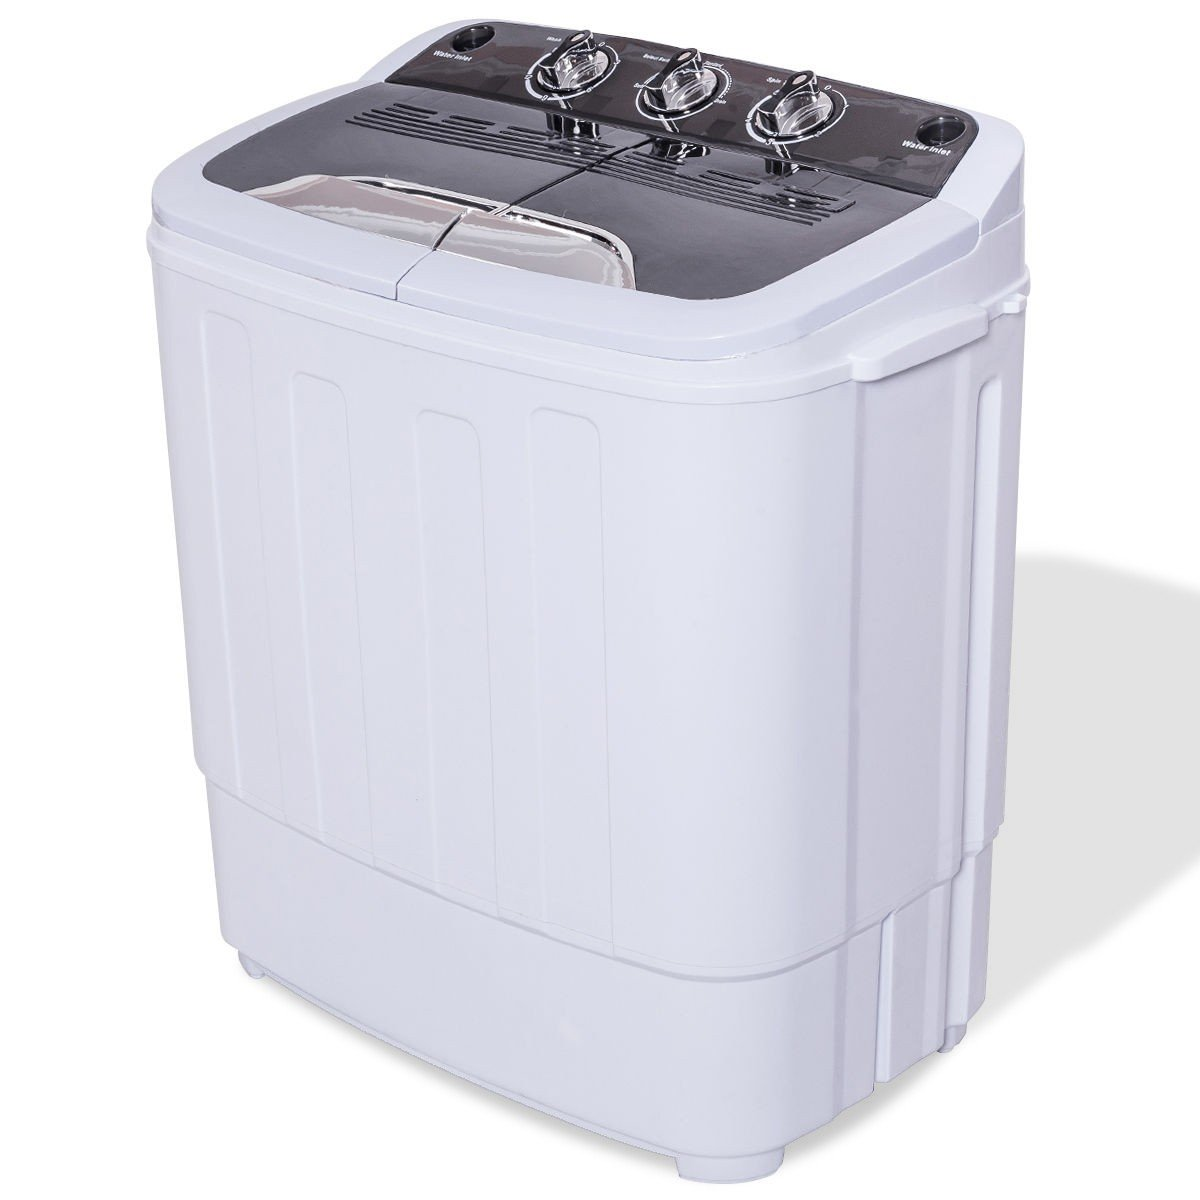 MD Group 8 lbs Compact Mini Twin Tub Washing Machine Washer Spiner